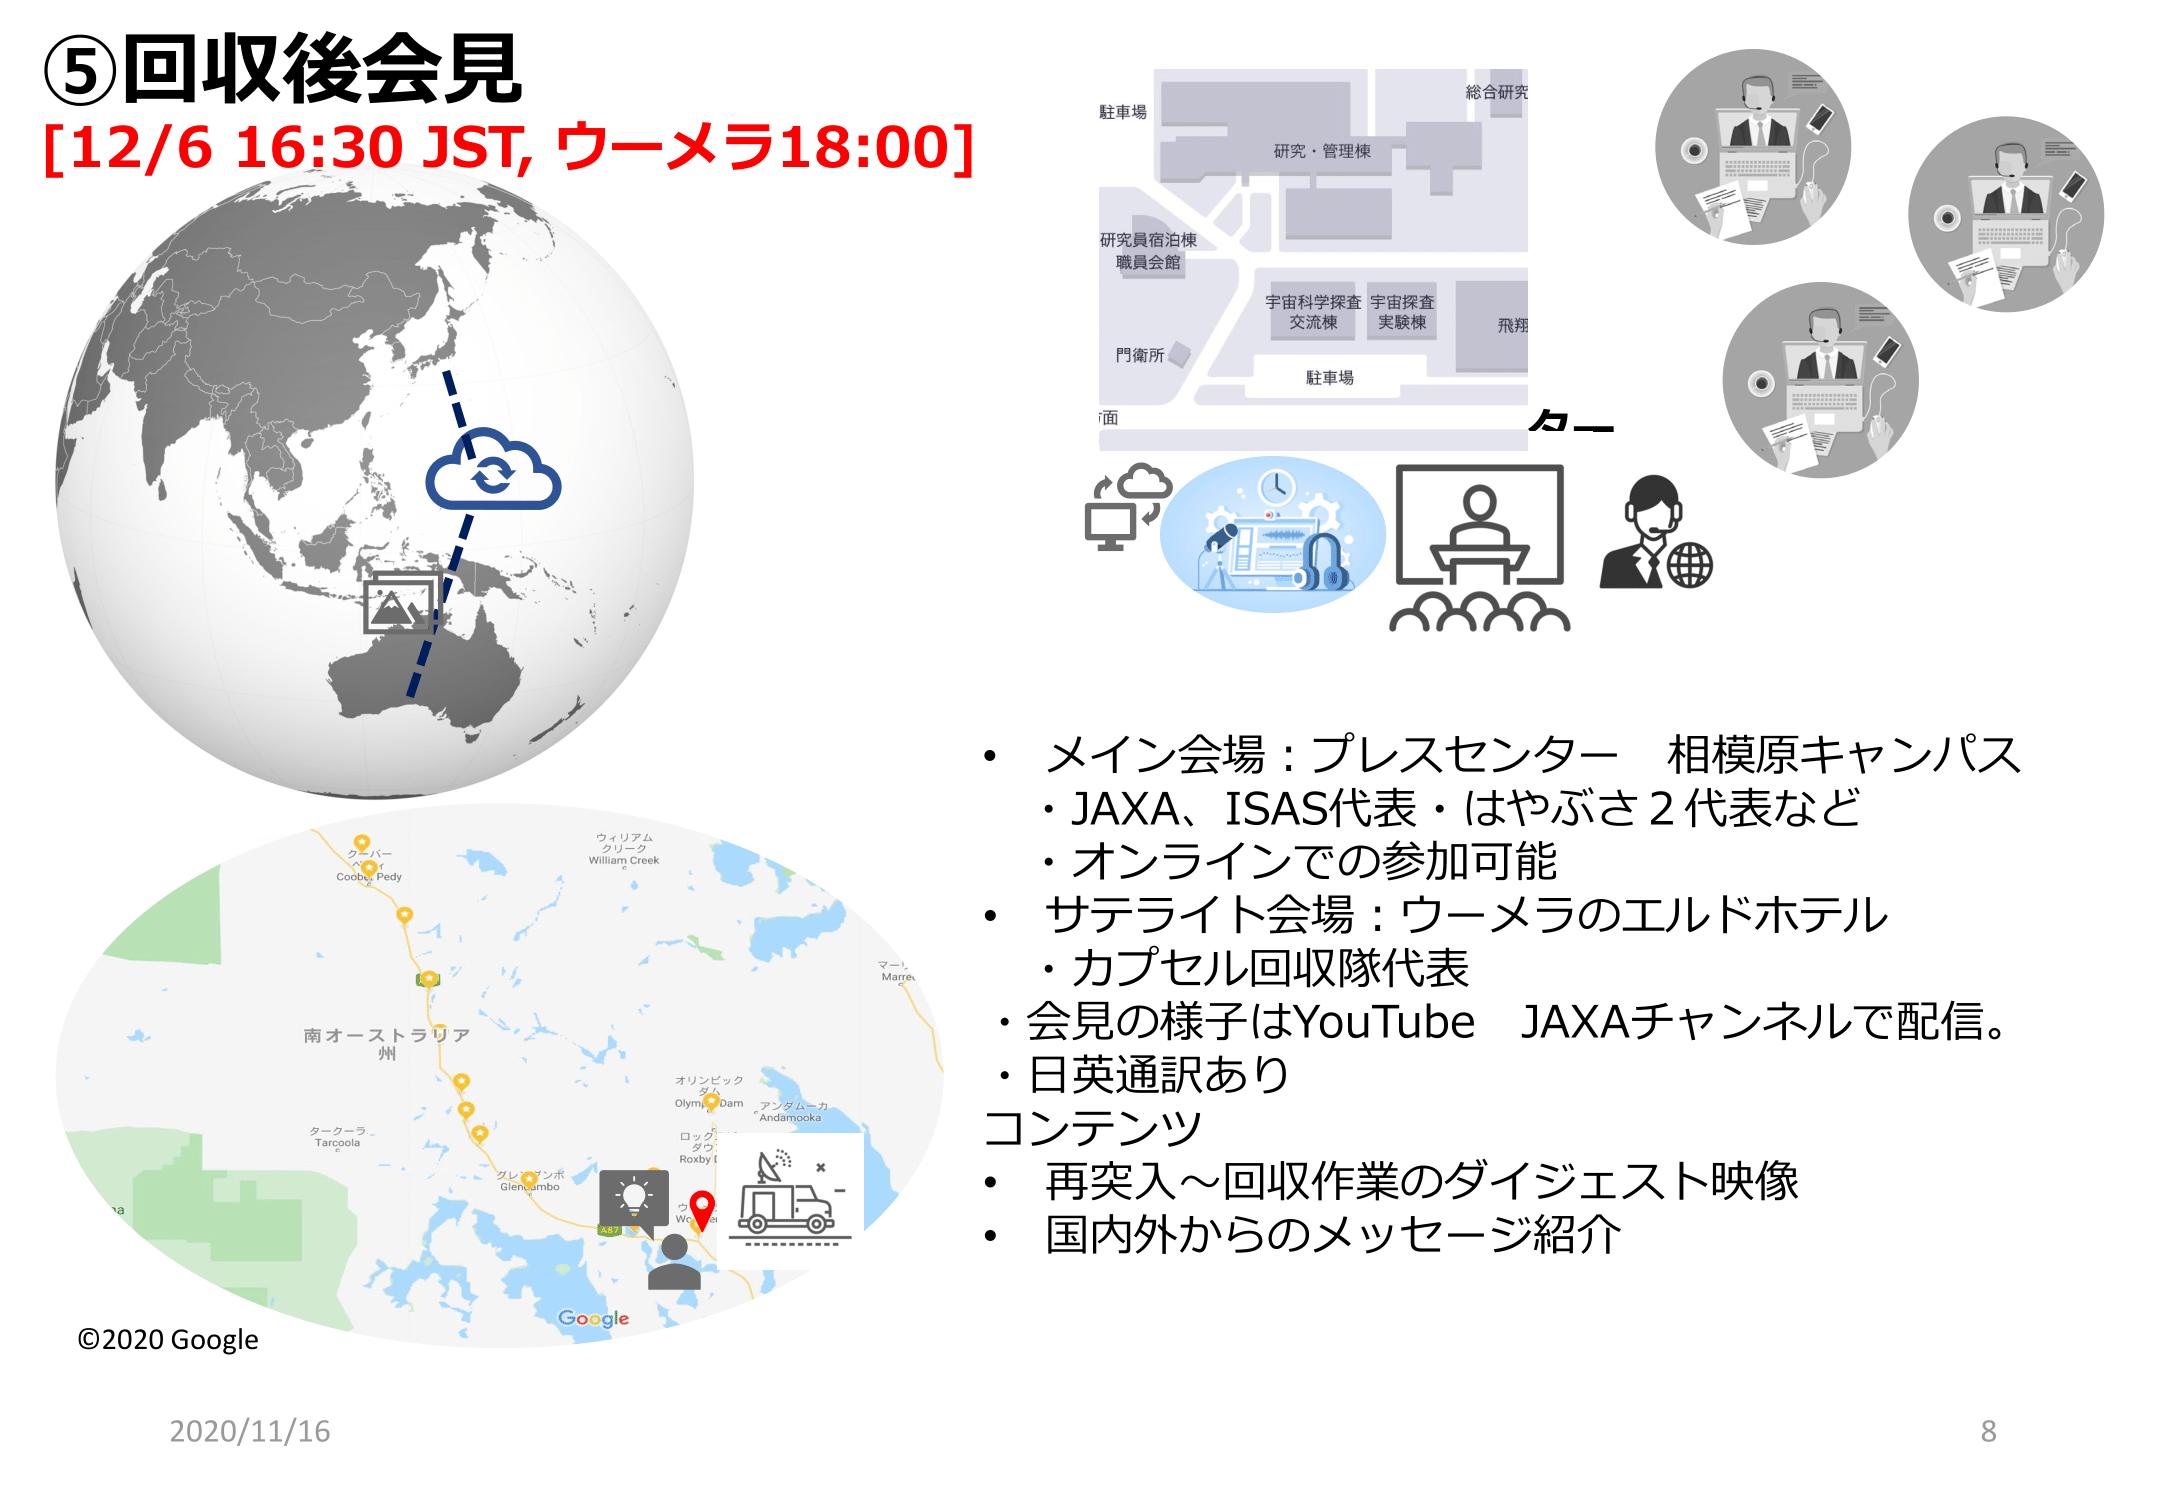 f:id:Imamura:20201117222242p:plain